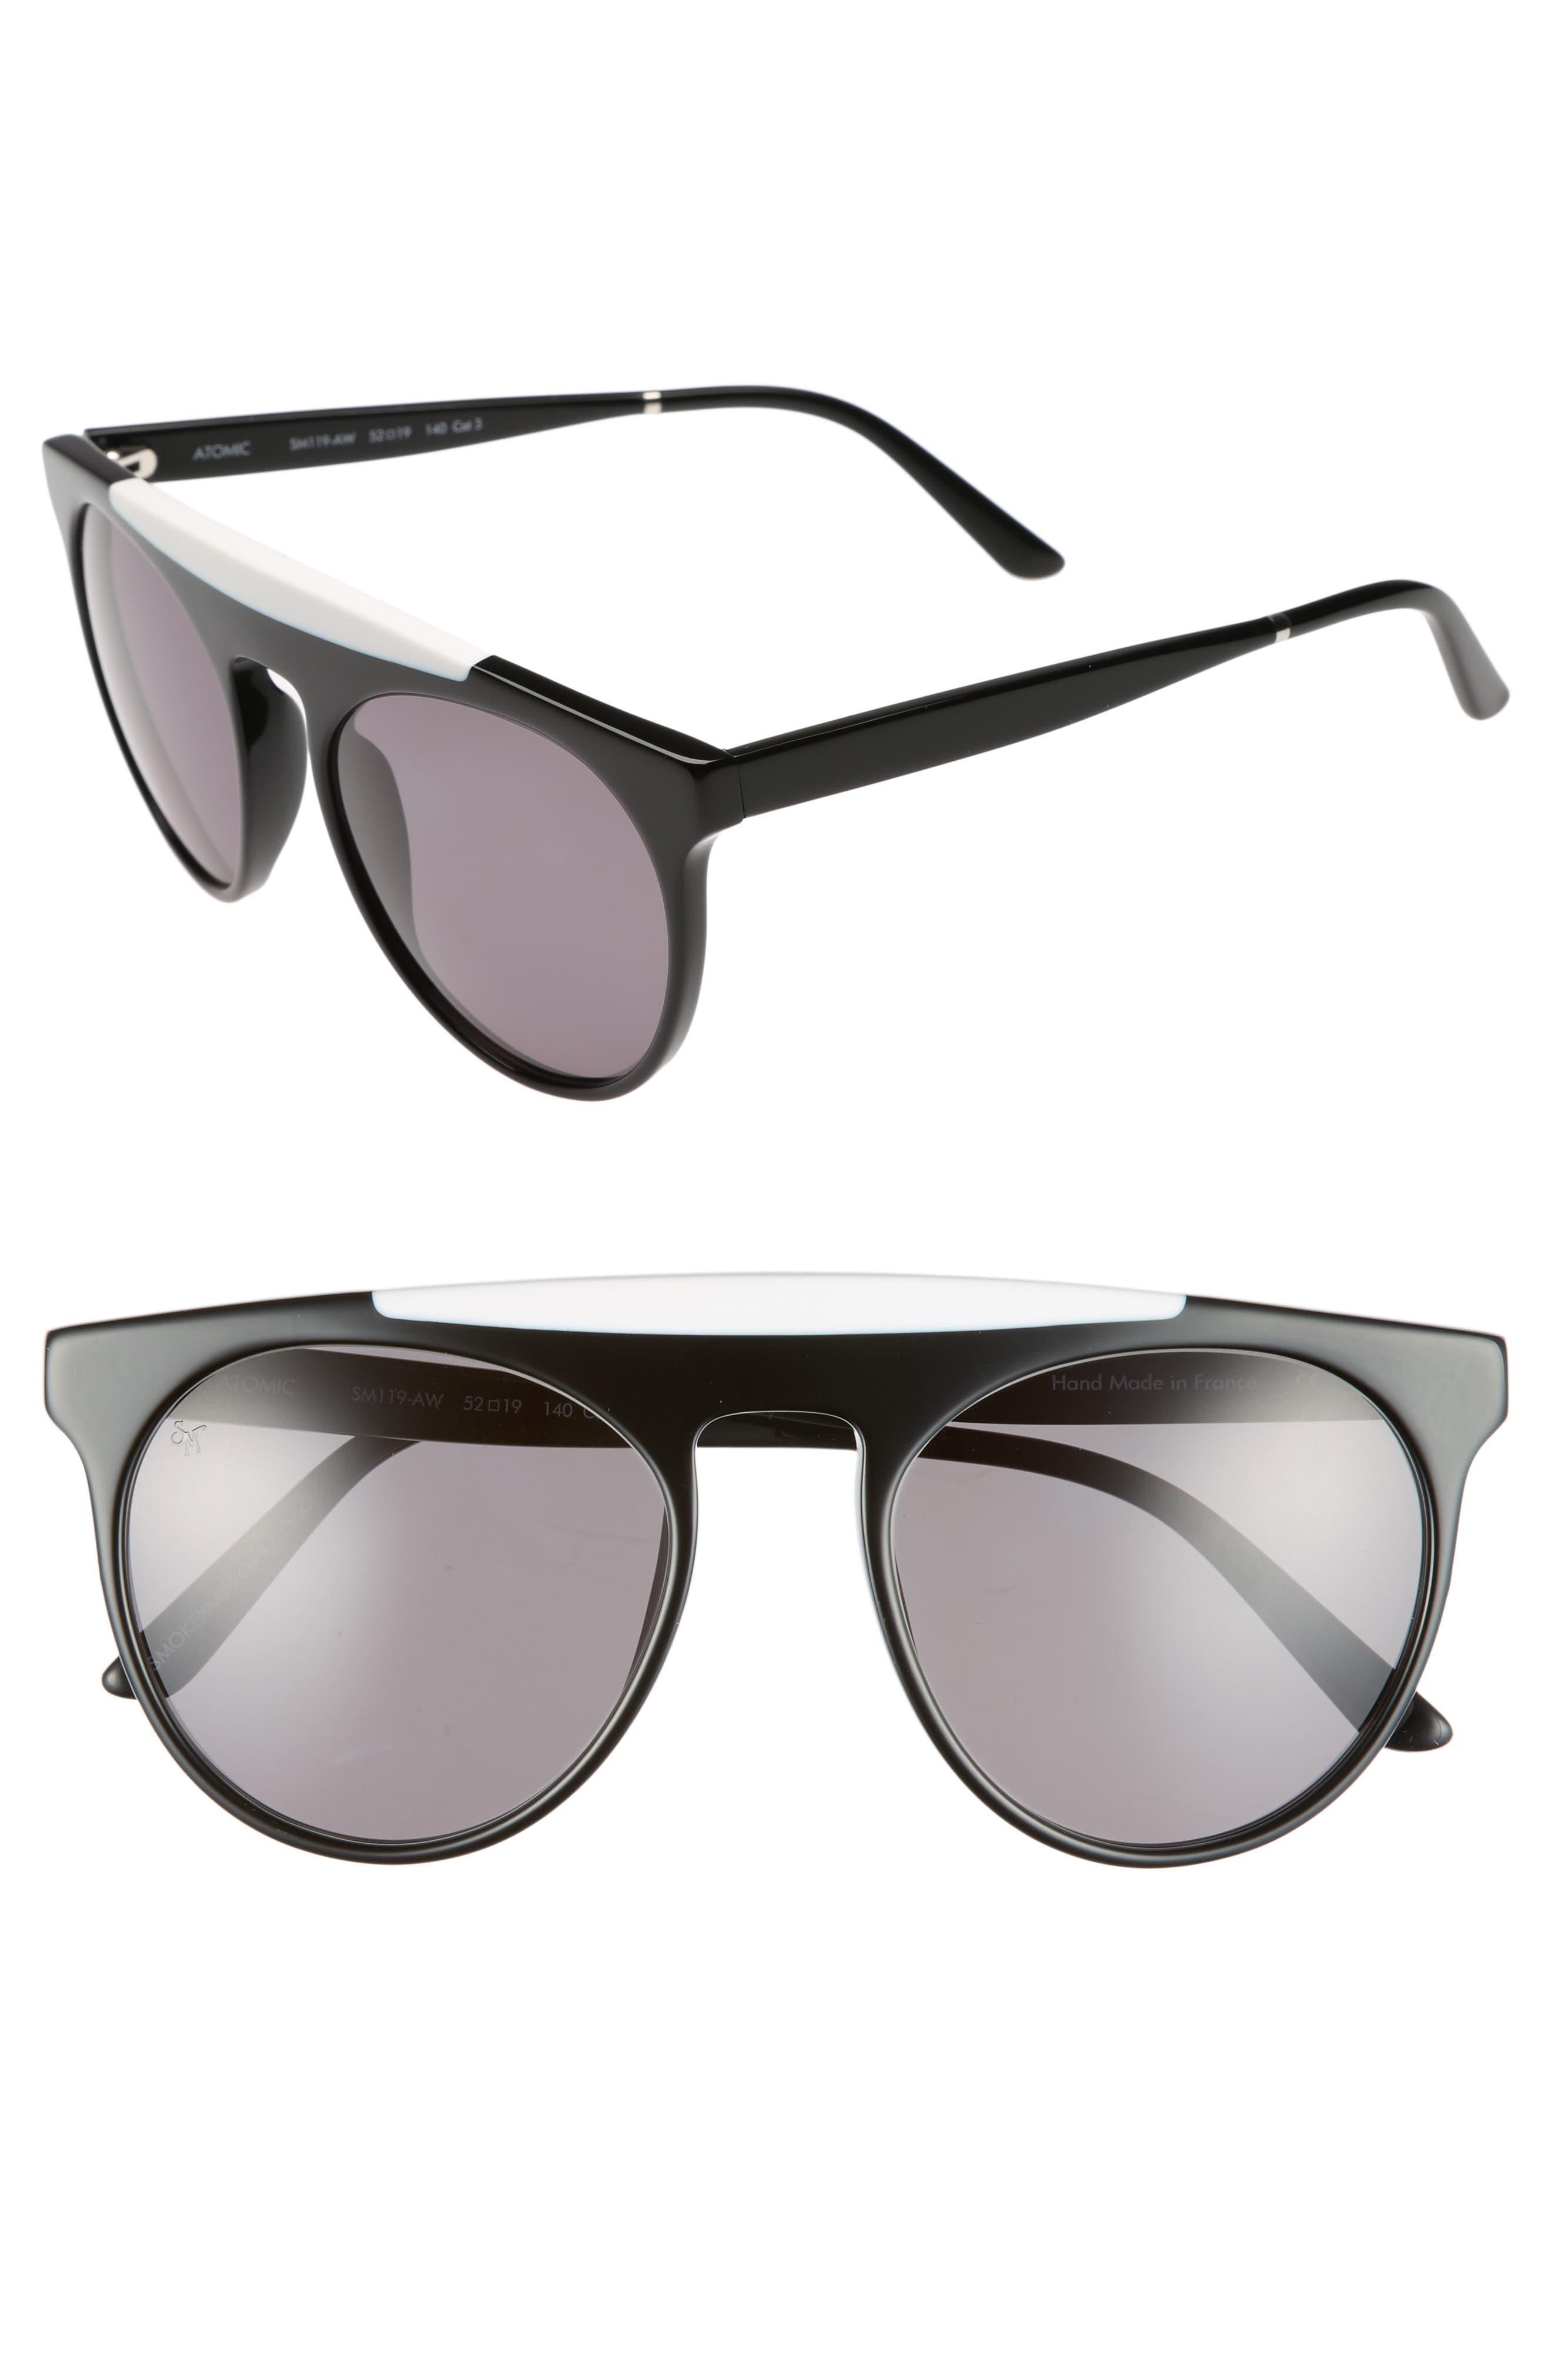 Atomic 52mm Sunglasses,                             Main thumbnail 1, color,